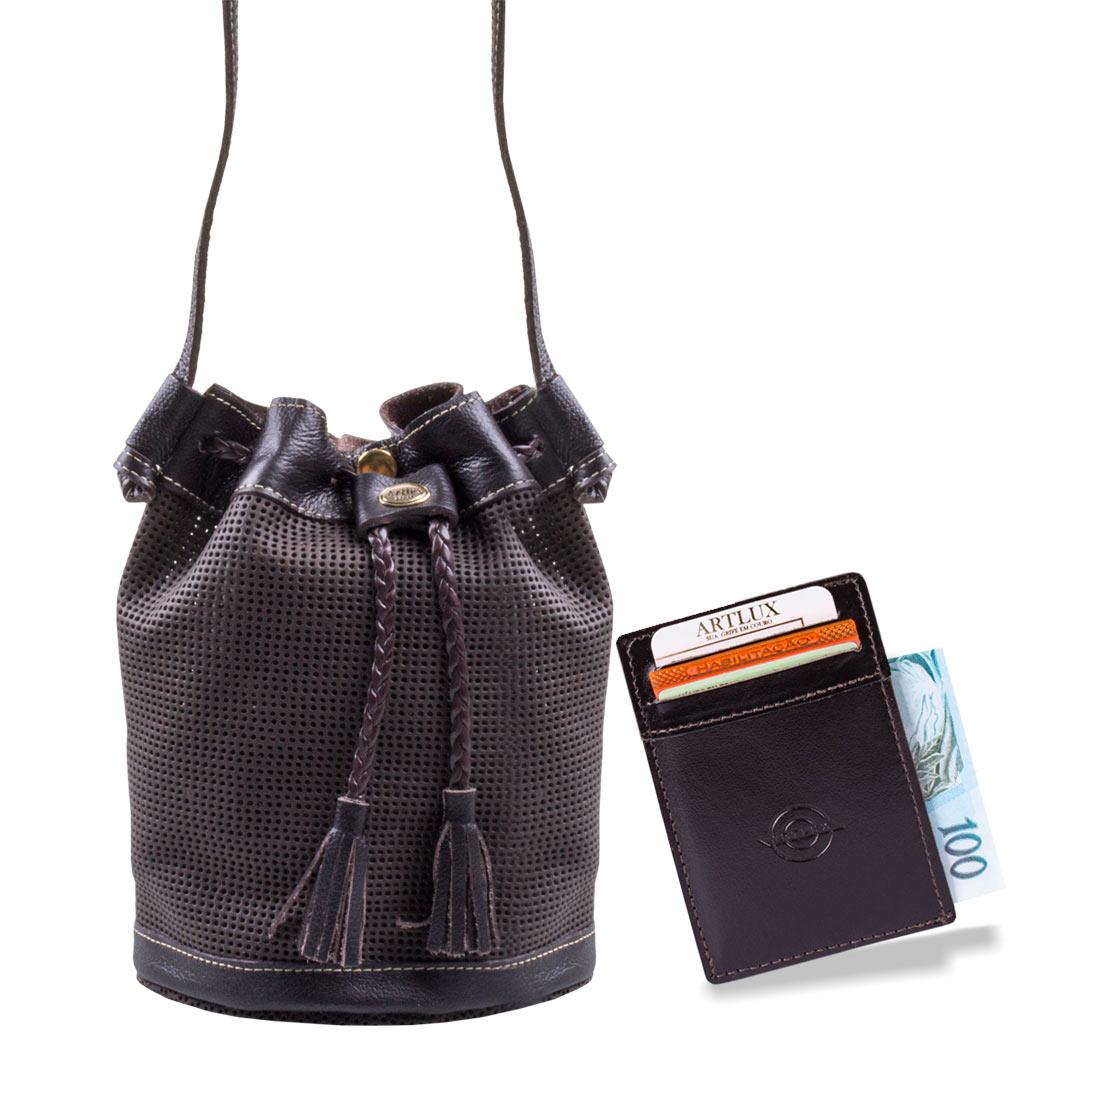 Kit Bolsa Saco Transversal + Mini Carteira Artlux